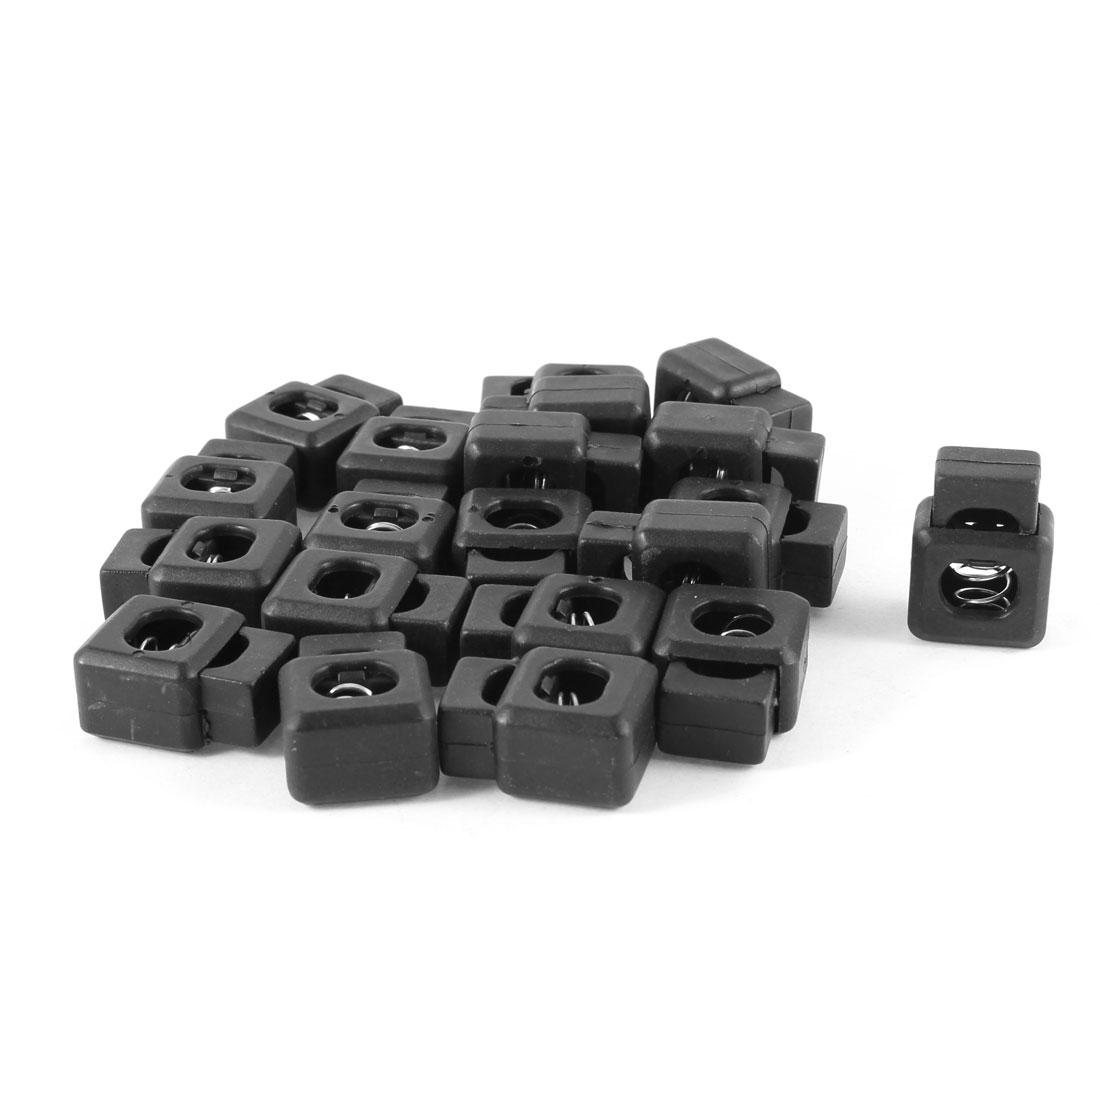 10mm Sigle Hole Rectangular Hard Plastic Black Cord Lock 20 Pcs